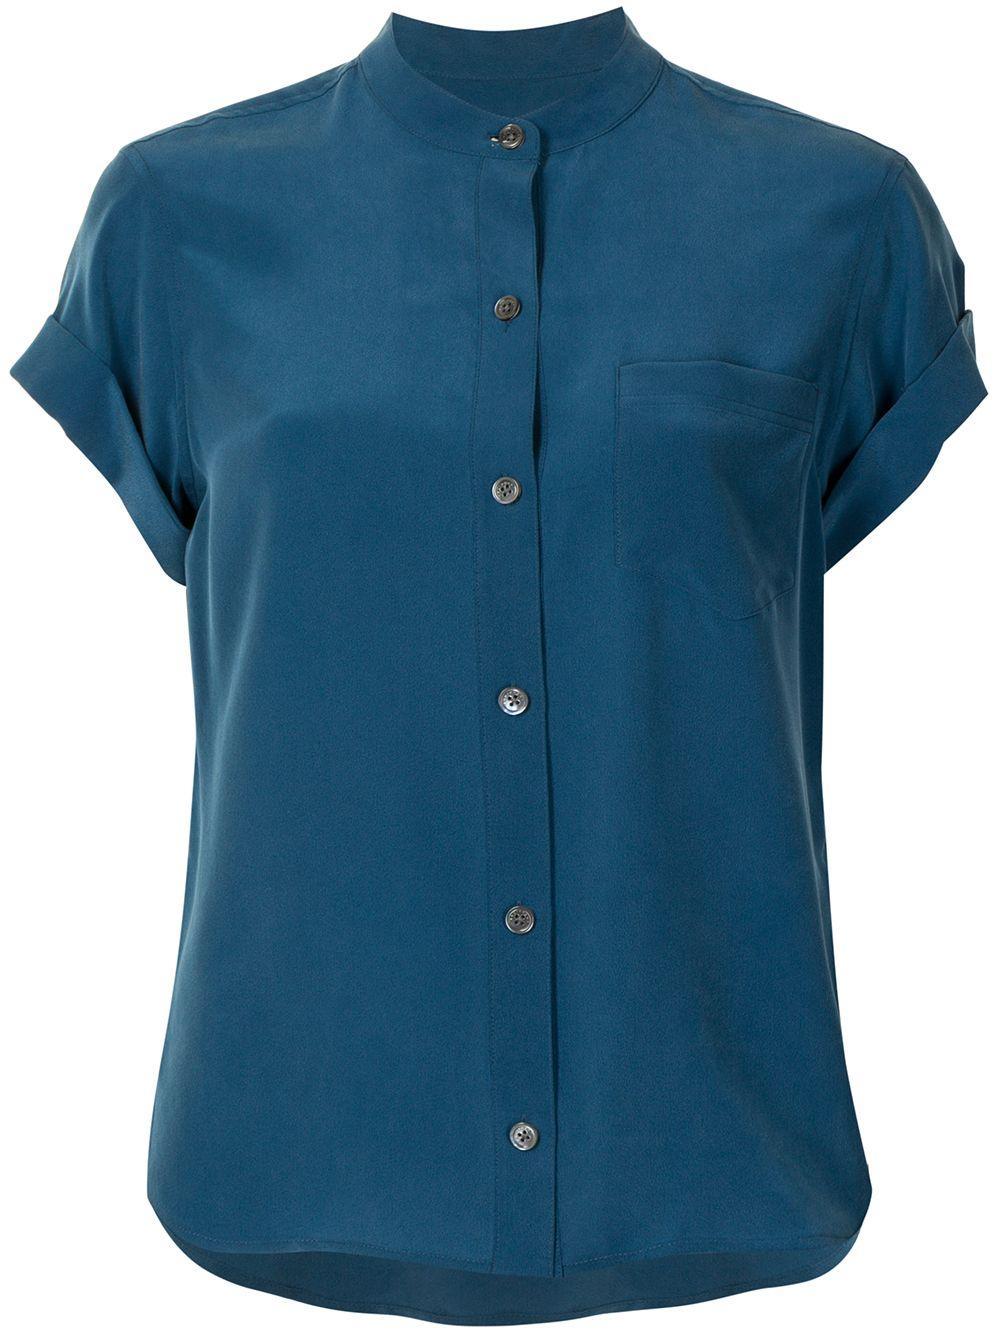 Narses Roll Sleeve Top Item # Q23-TP03912